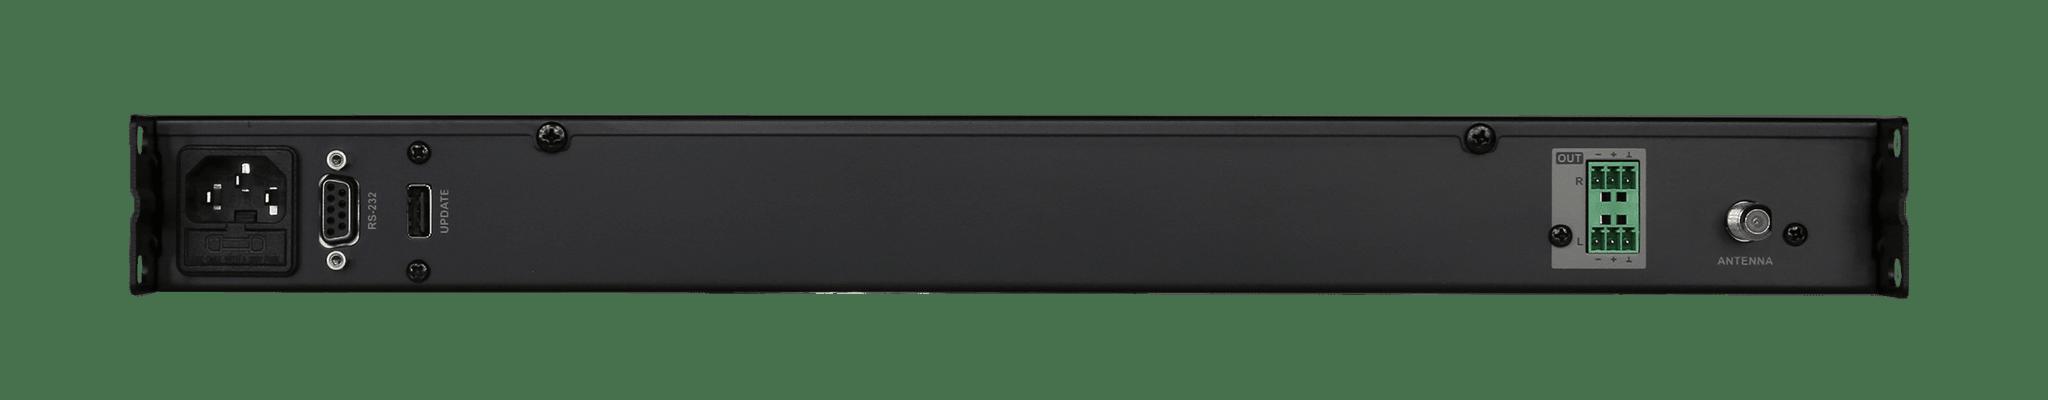 DSP40 - DAB/DAB+/FM tuner